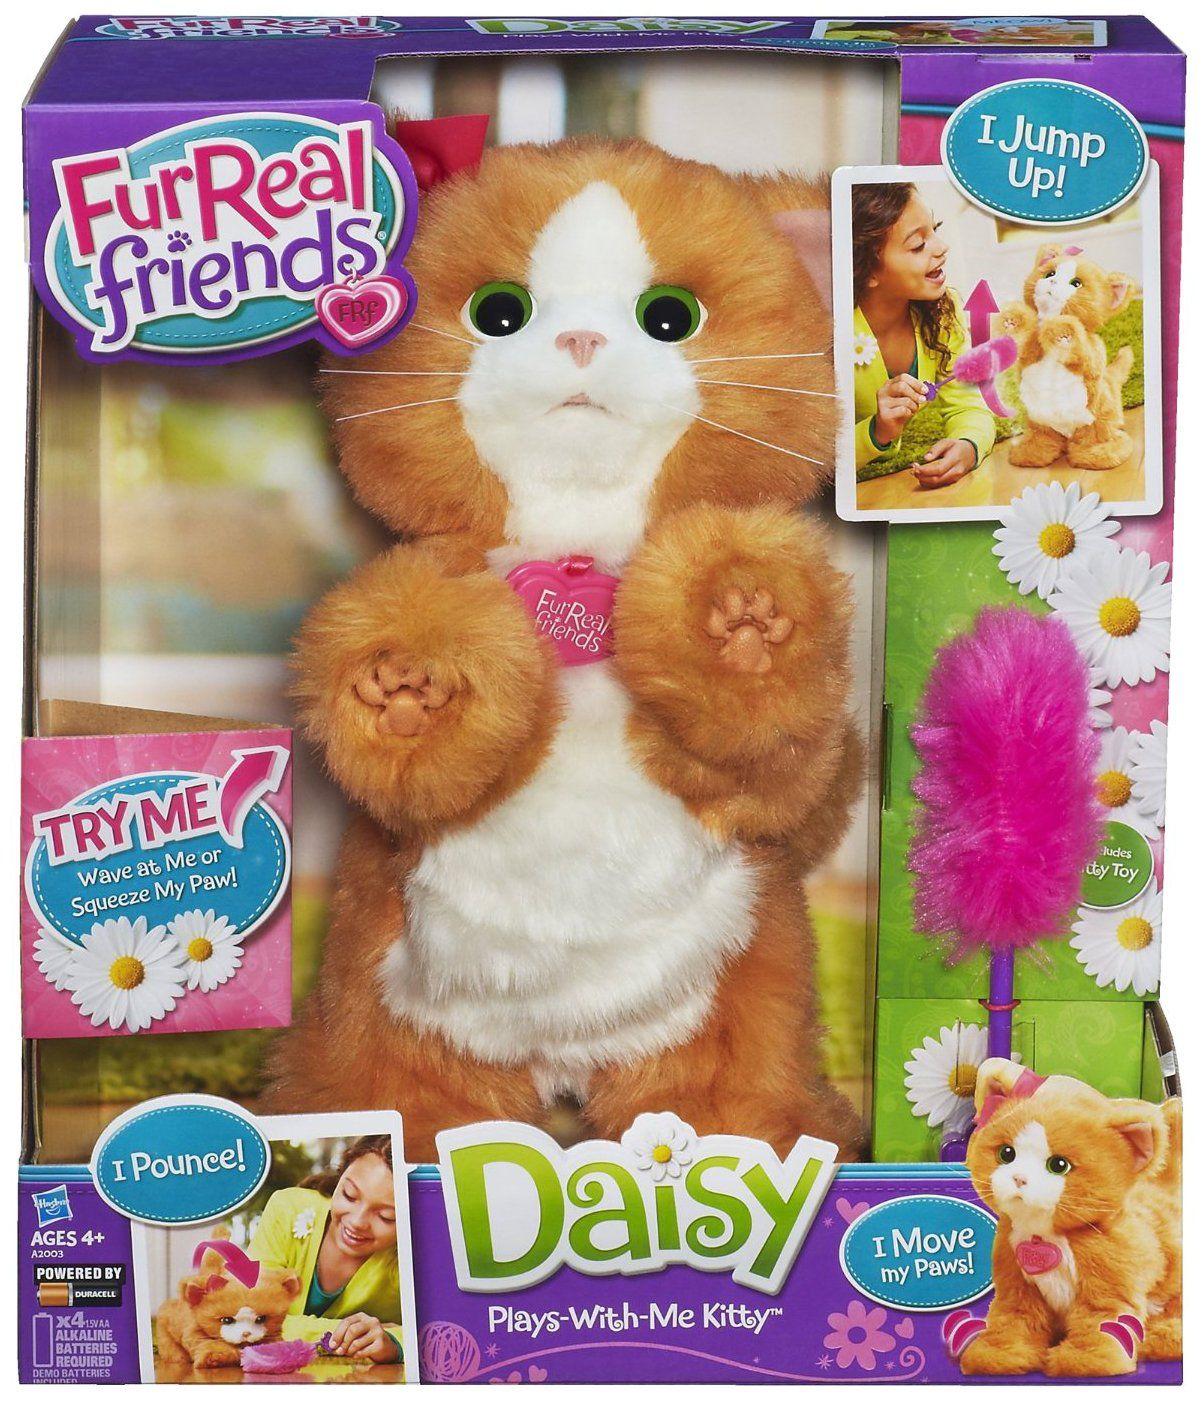 Daisy Fur Real Friends Kat Gespot Op Bambini Com Fur Real Friends Cat Toys Toys